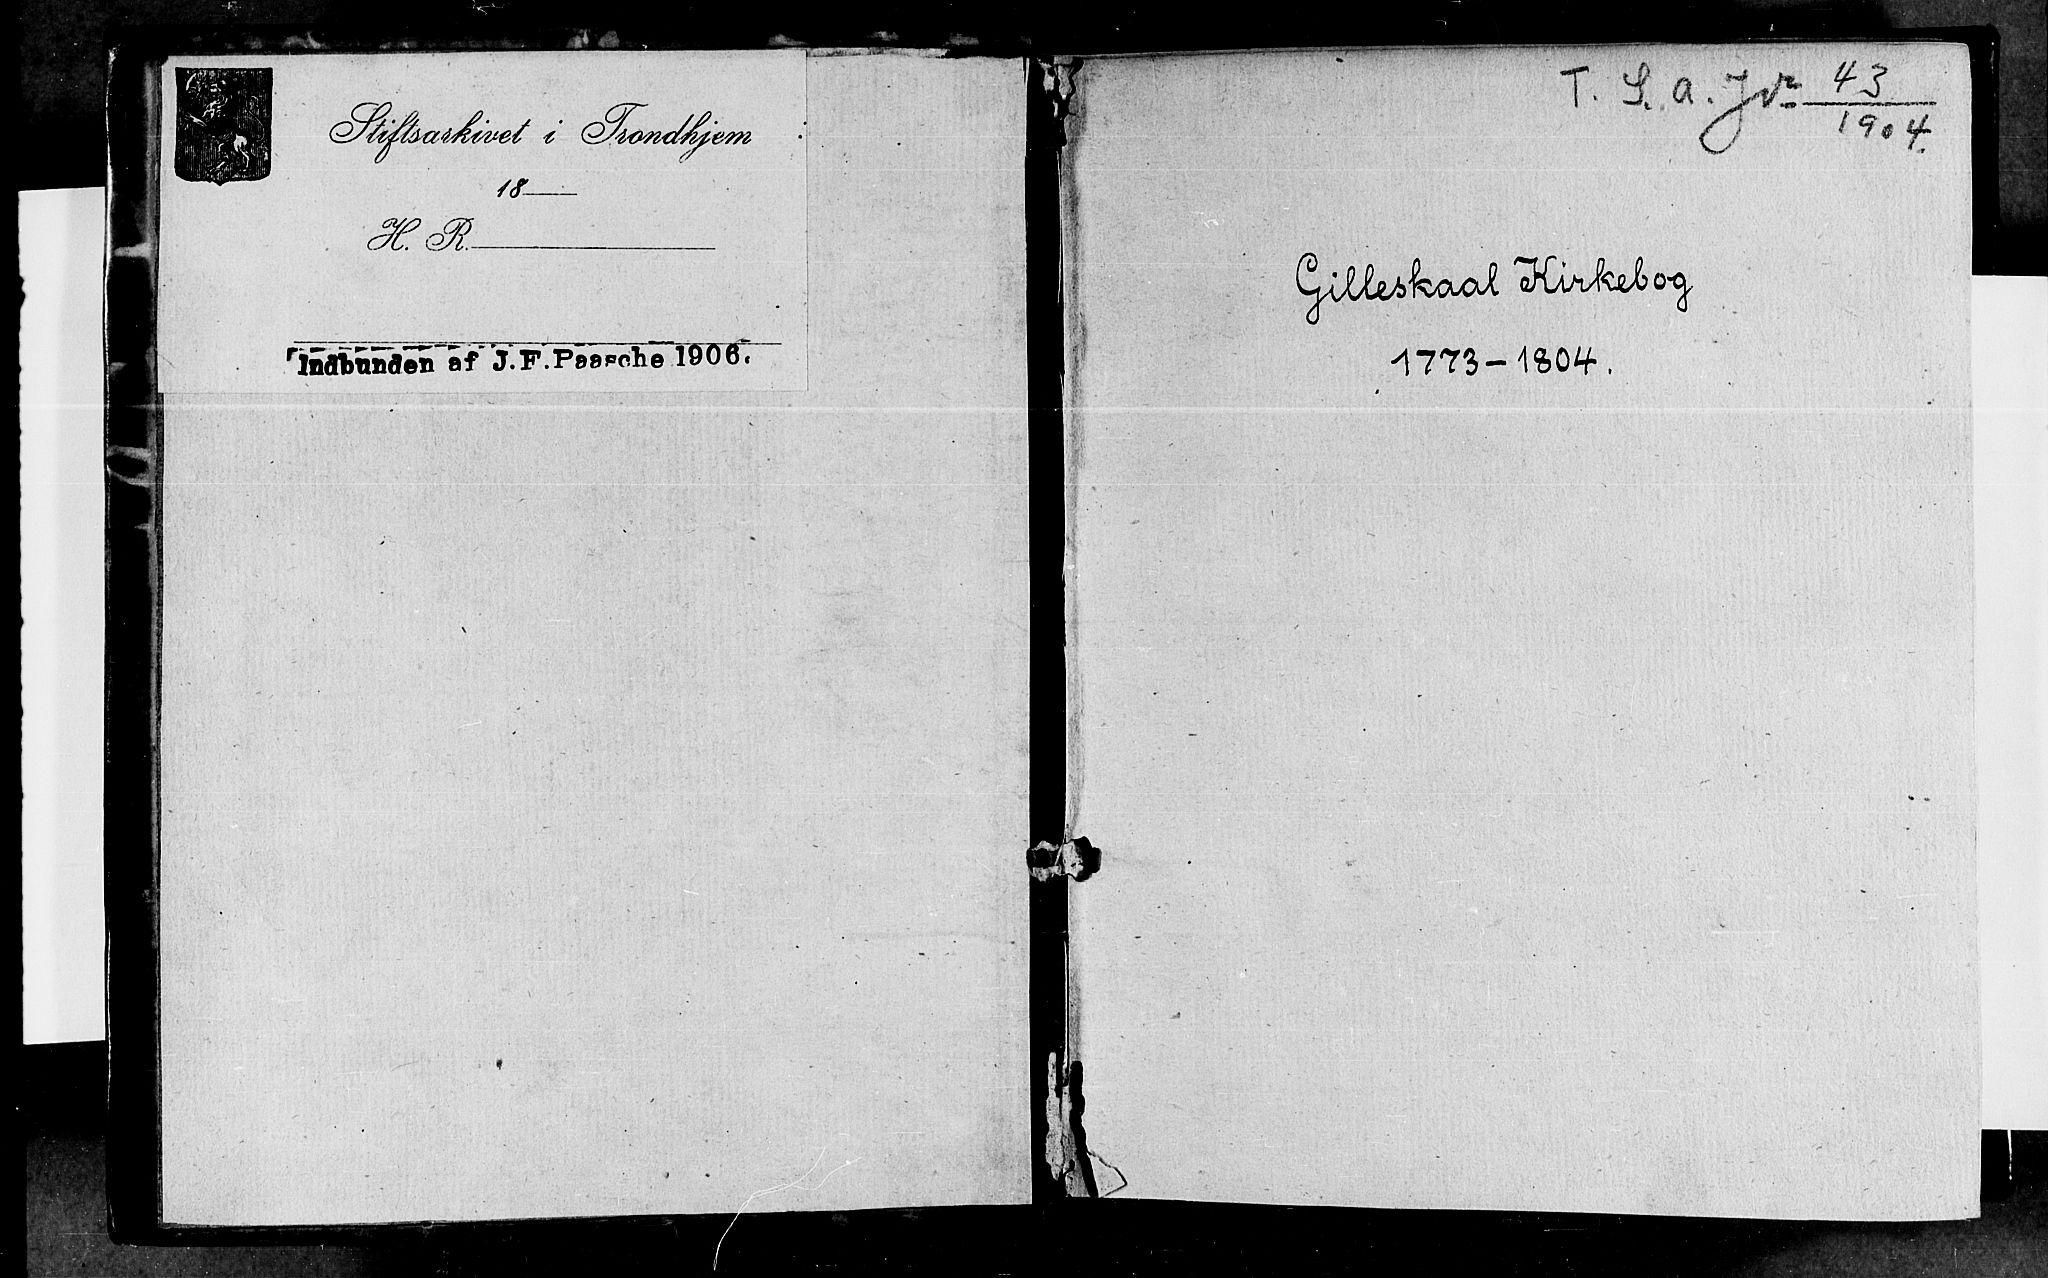 SAT, Ministerialprotokoller, klokkerbøker og fødselsregistre - Nordland, 805/L0094: Ministerialbok nr. 805A01, 1773-1804